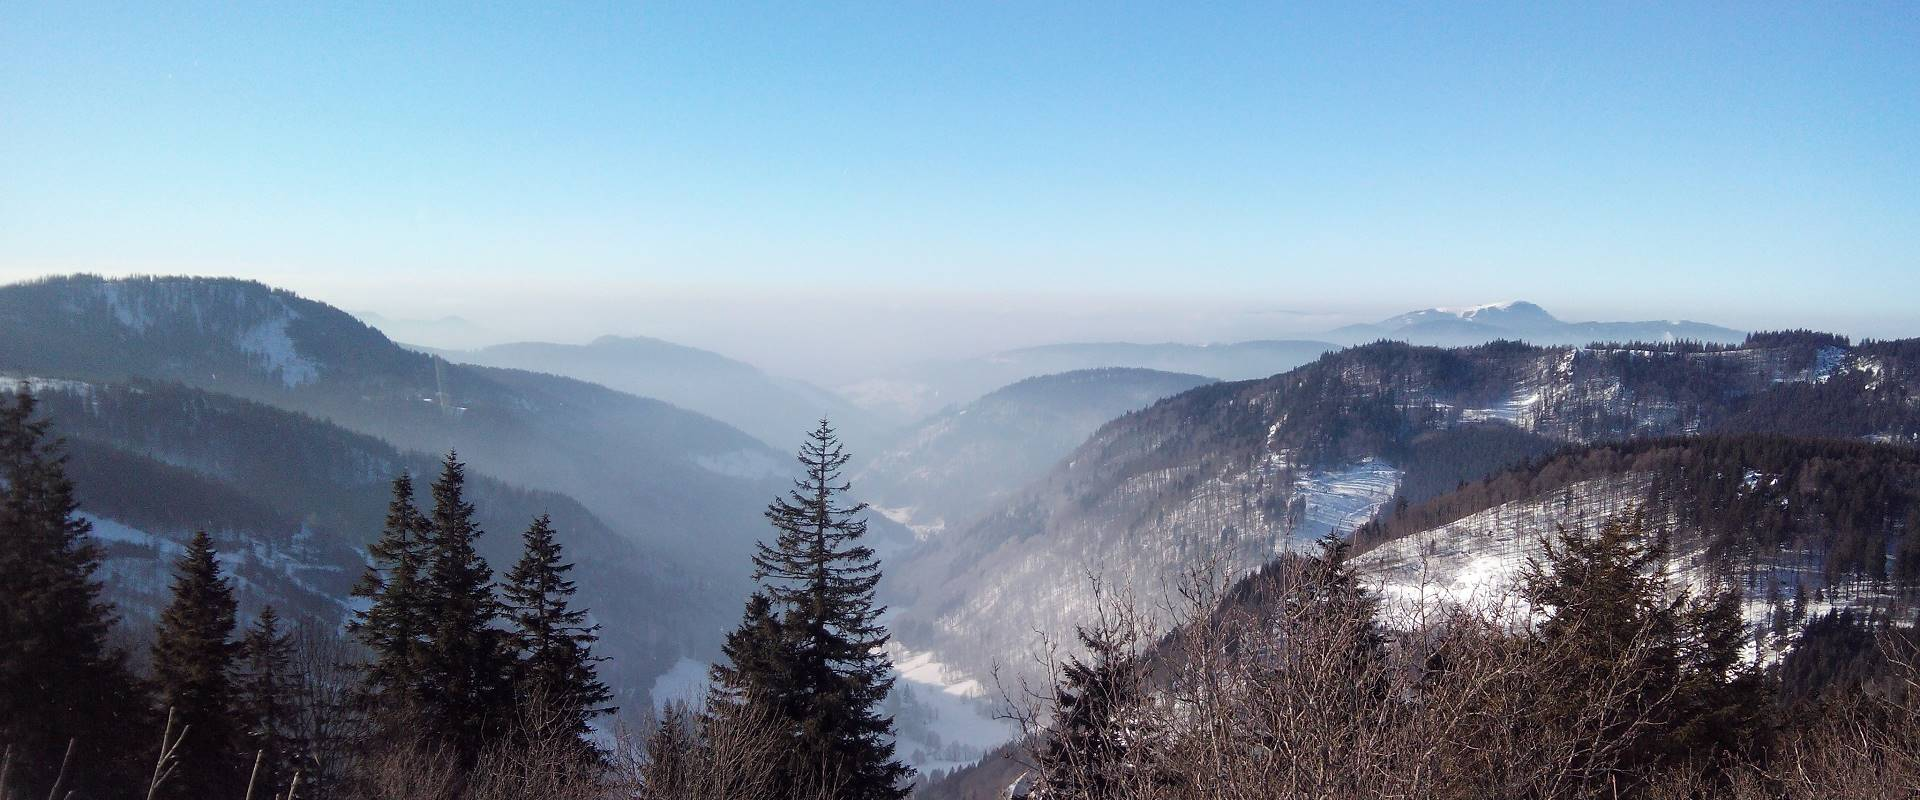 Feldberg_Griesbachhof-Schwarzwald